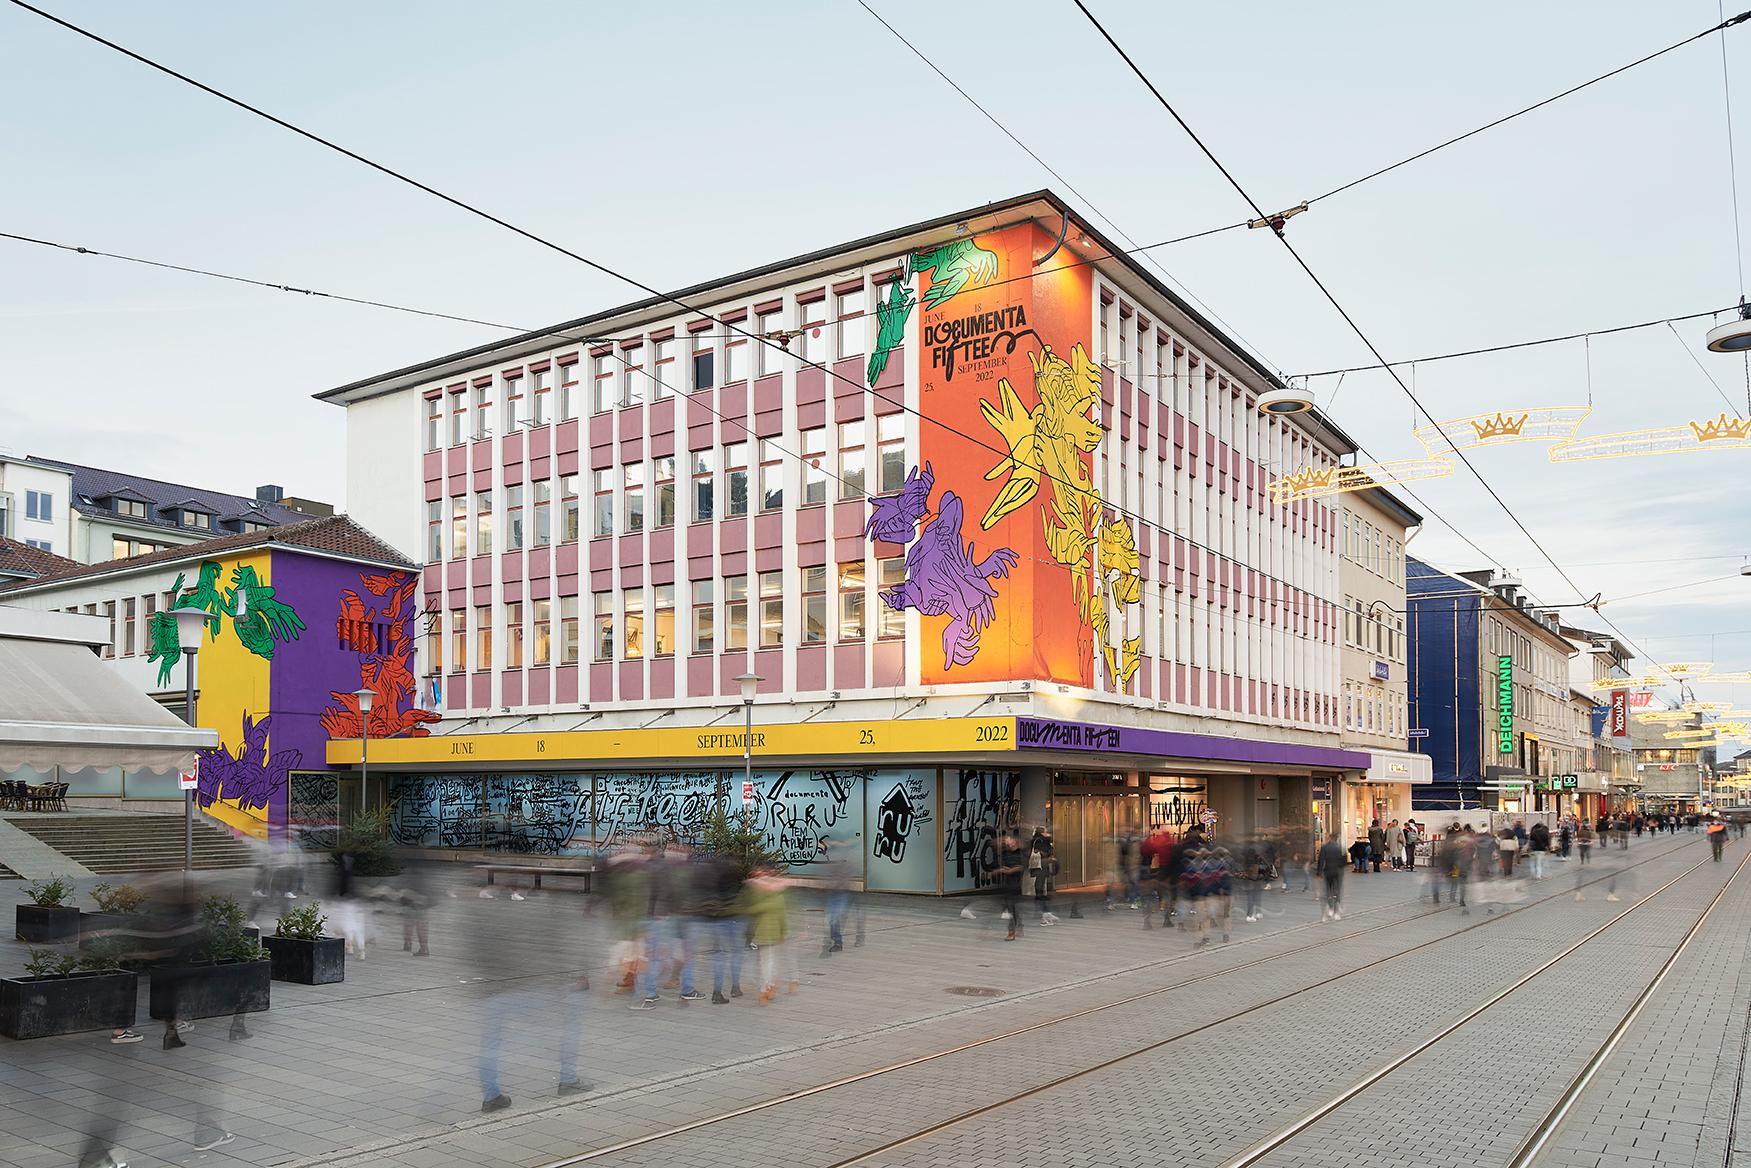 Das Erscheinungsbild der documenta fifteen an der Fassade des ruruHaus